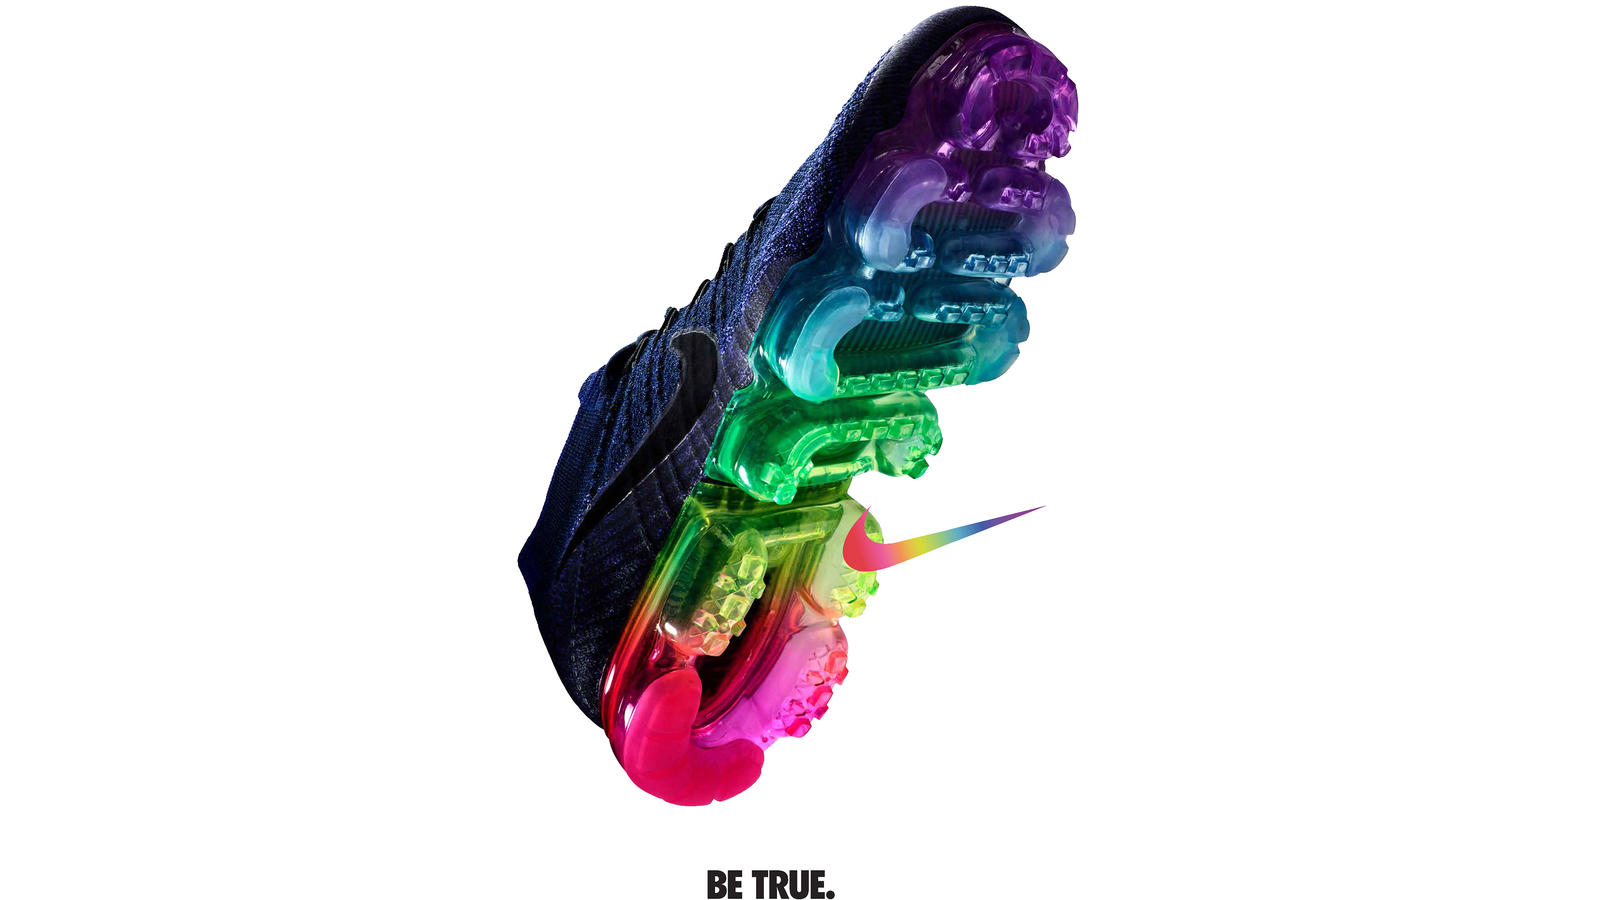 855b9e29bb56b BETRUE 2017 - Nike News